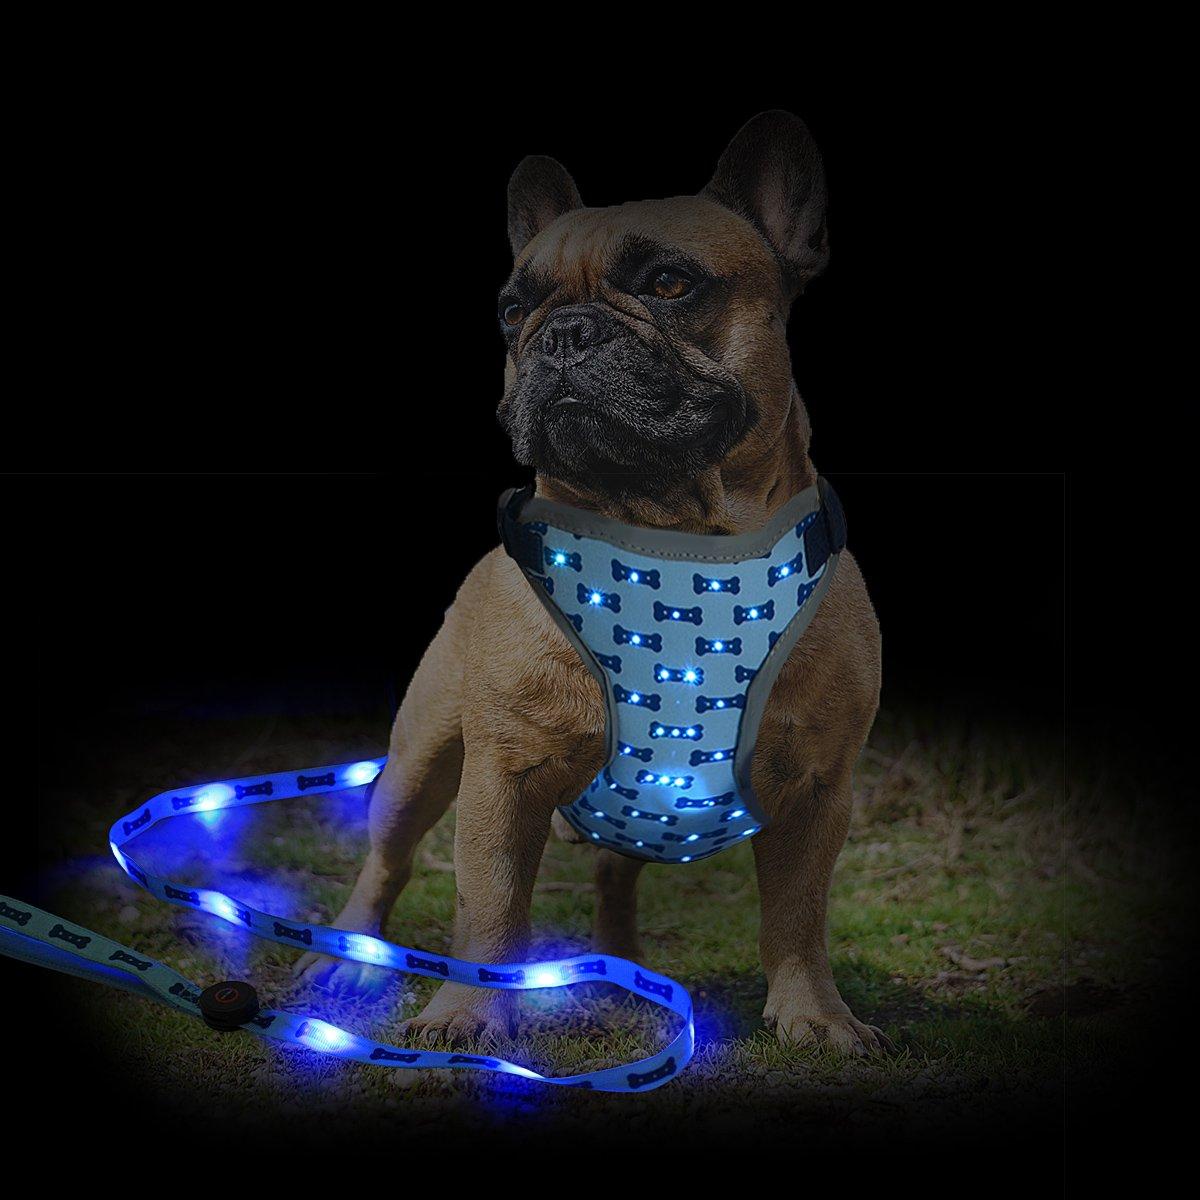 Namsan LED Dog Harness and Leash Set- Outdoor Adjustable Pet Vest Safety Dog Leash for Medium Dogs, Blue by Namsan